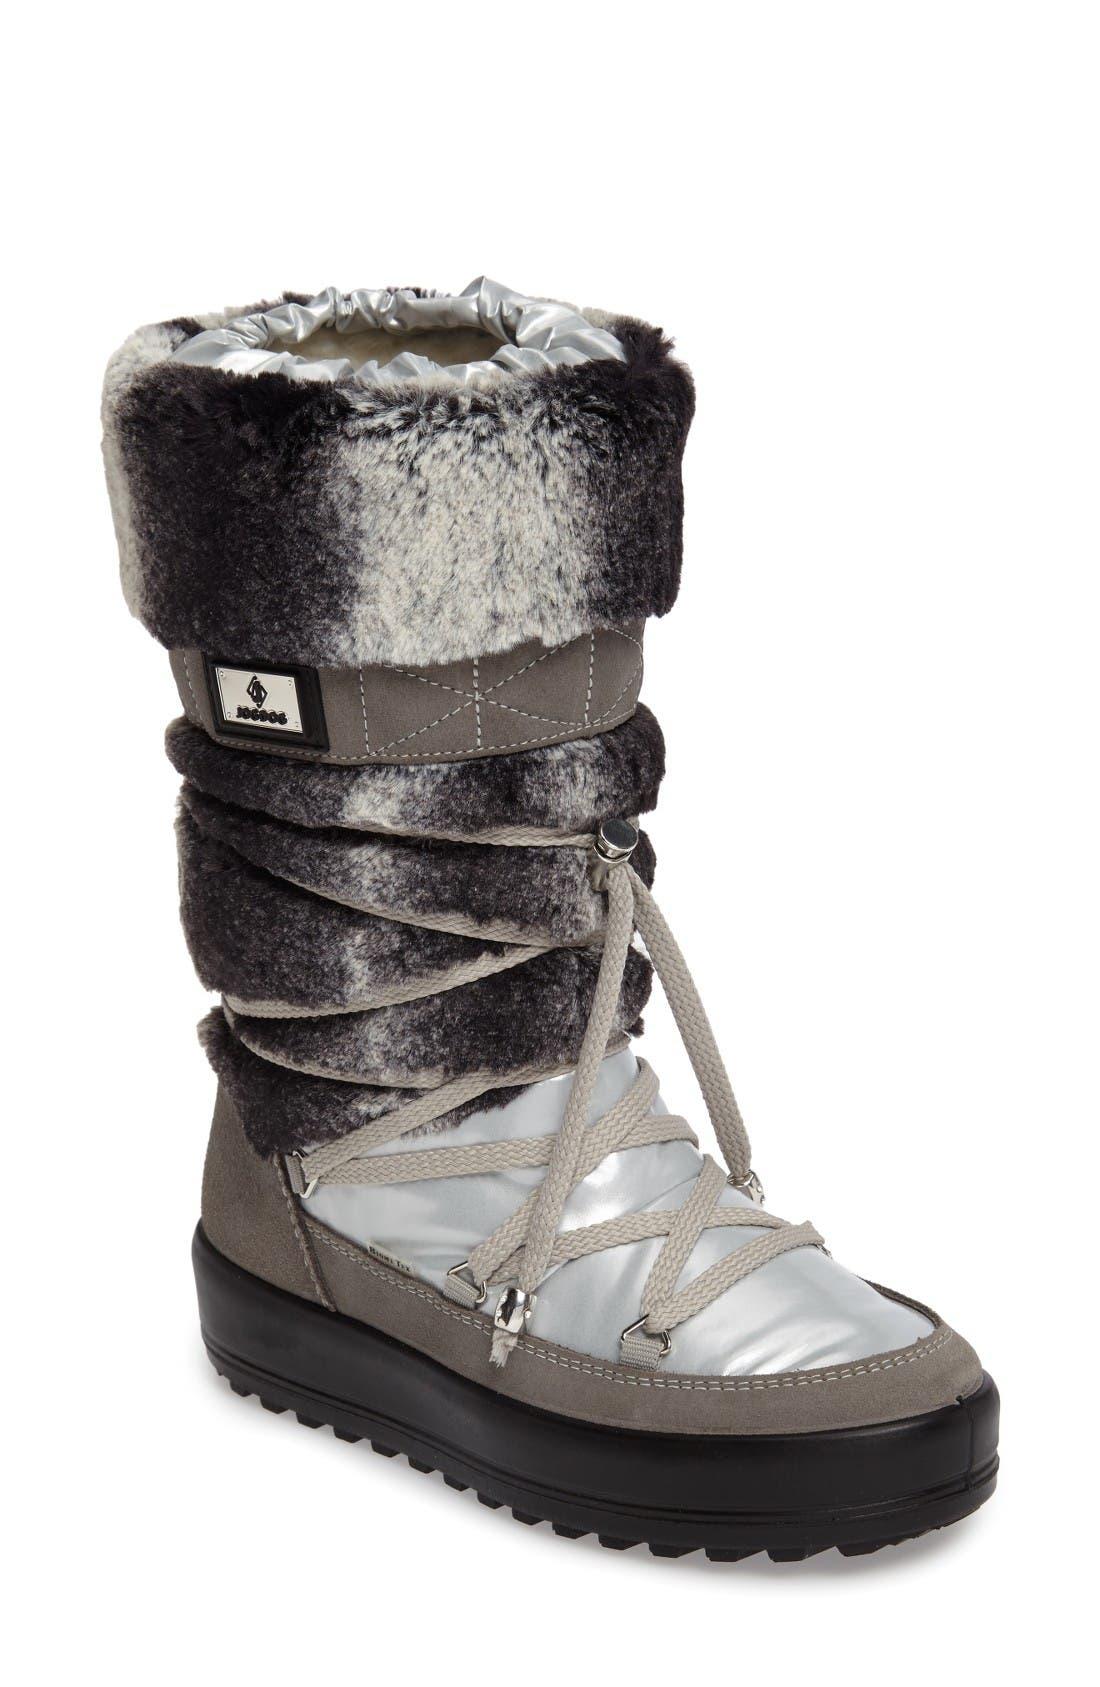 Kitzbuhel Faux Fur Waterproof Quilted Boot,                             Main thumbnail 1, color,                             Silver/ Lapin